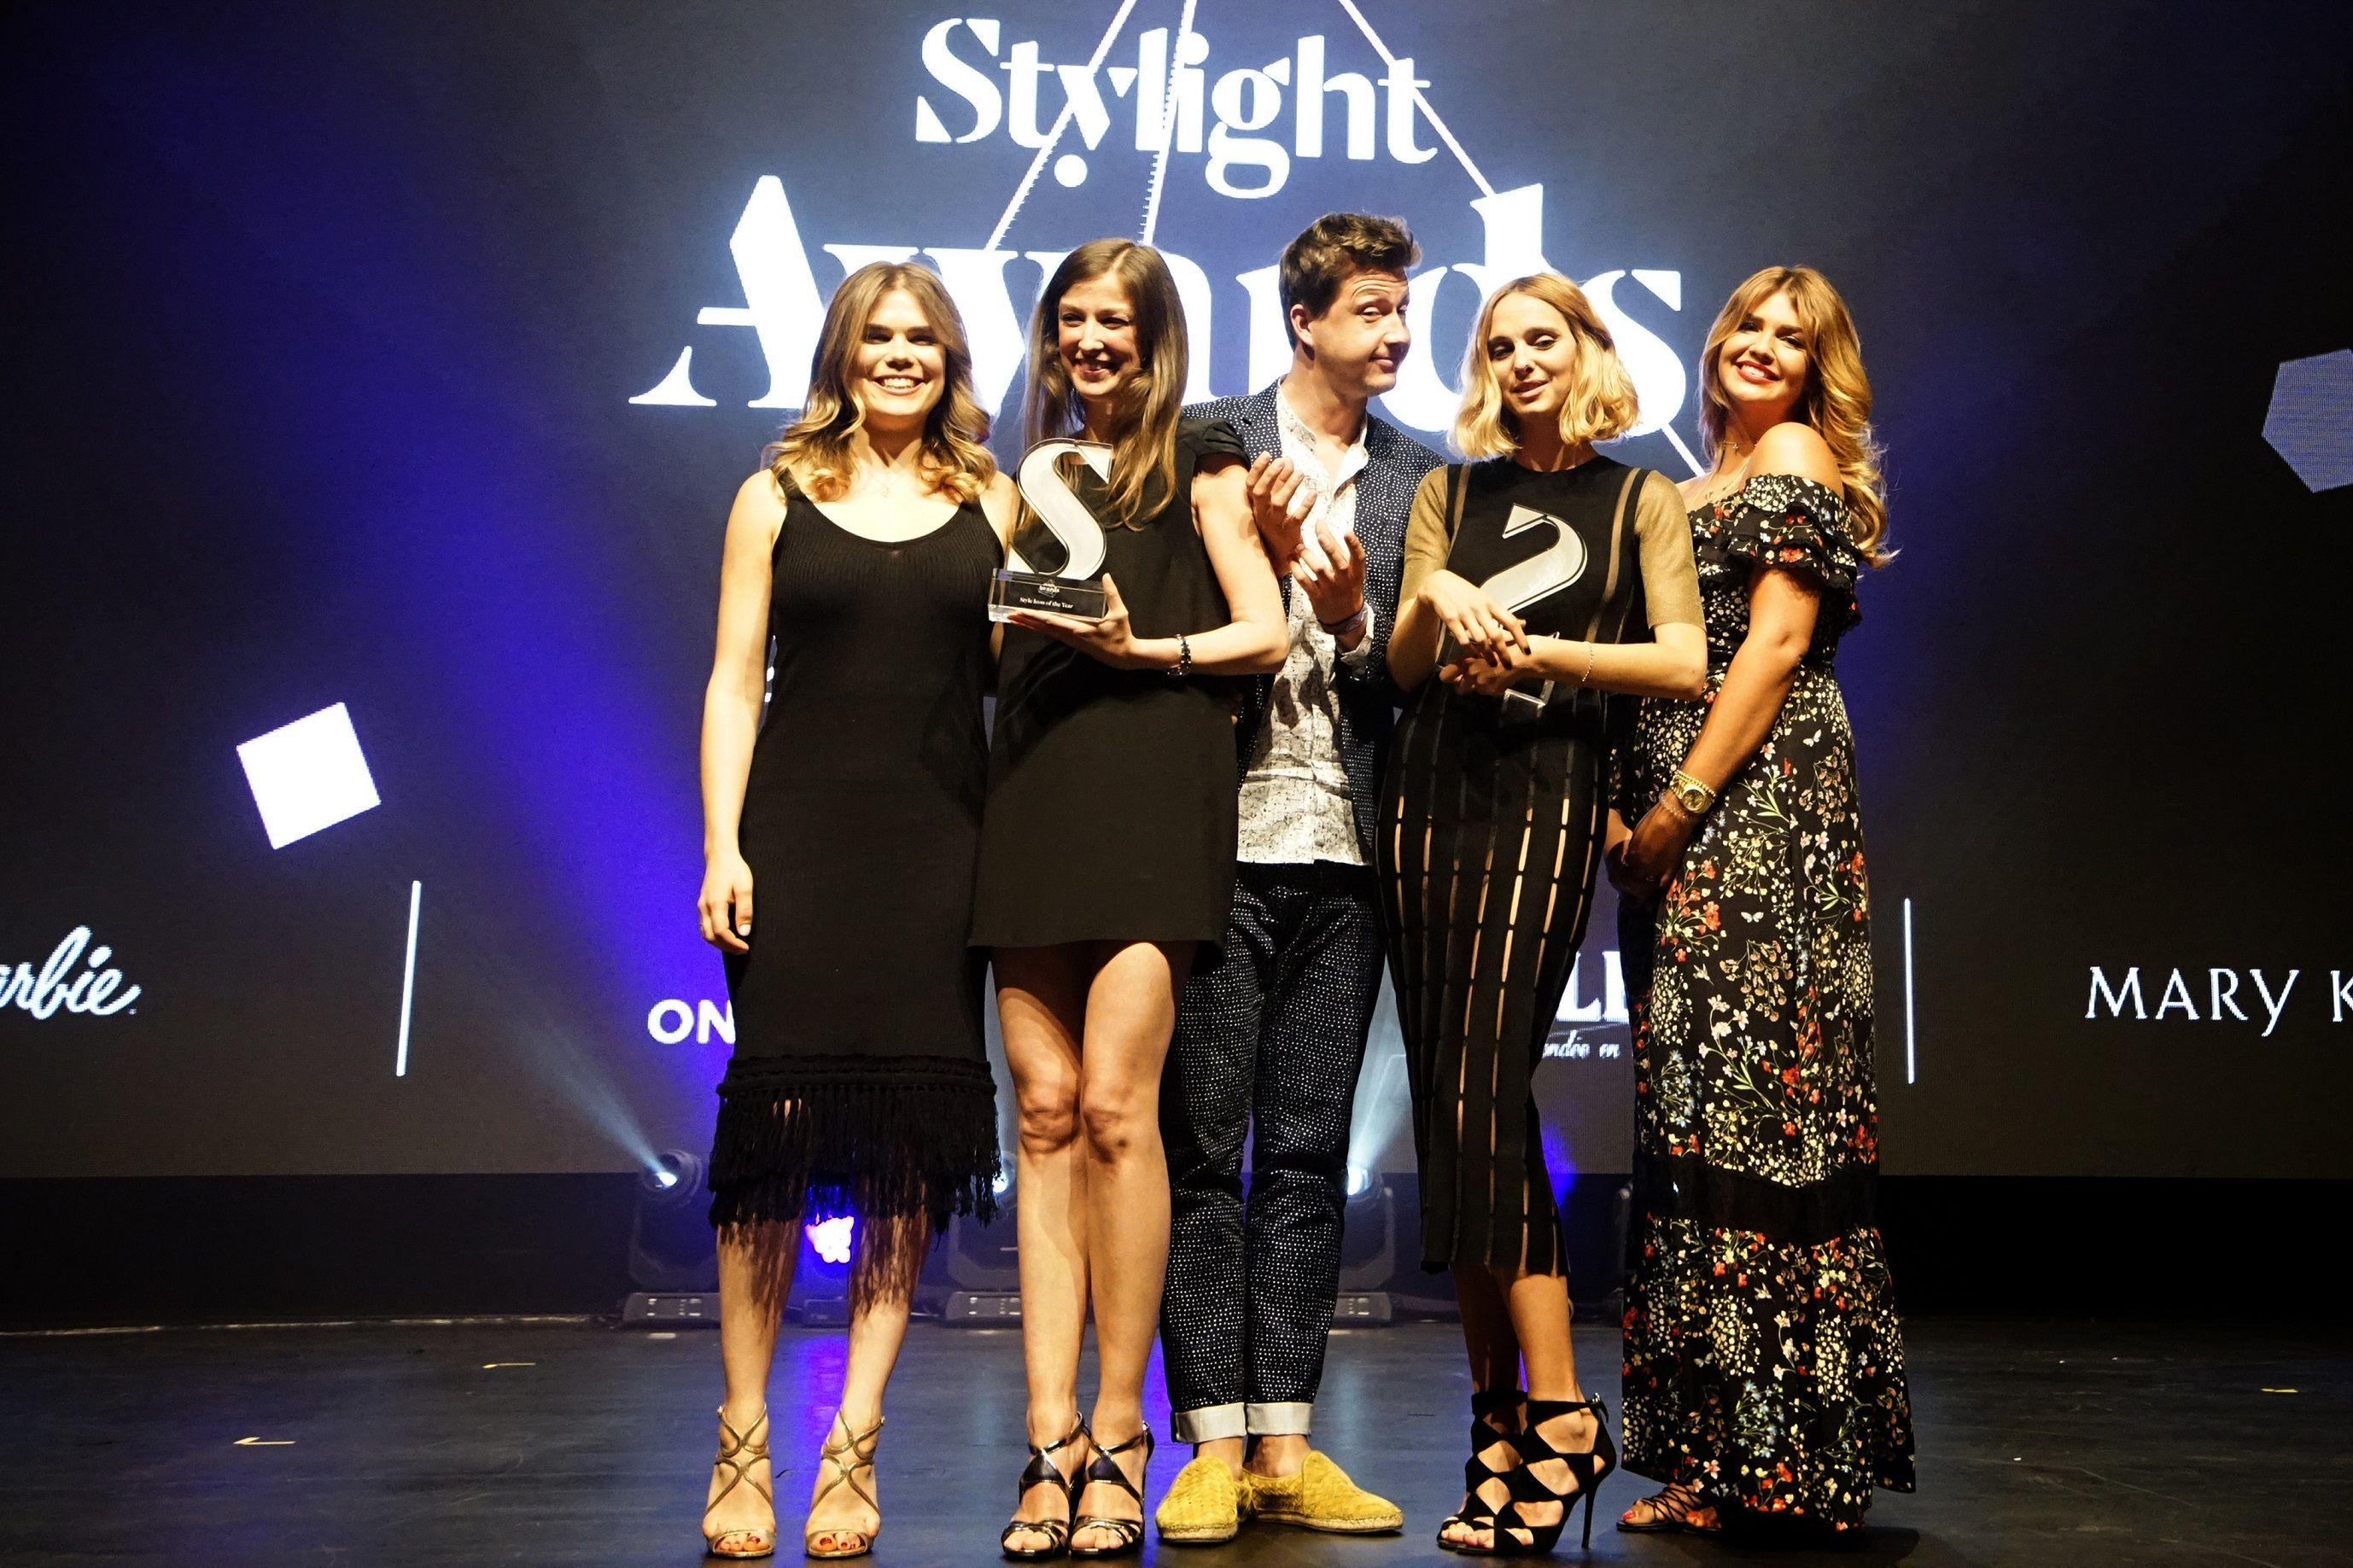 Stylight Awards 2016 Winners - Madeleine Shaw, Alexandra Maria Lara, Yvan Rodic, Candela, Nova Lana Love